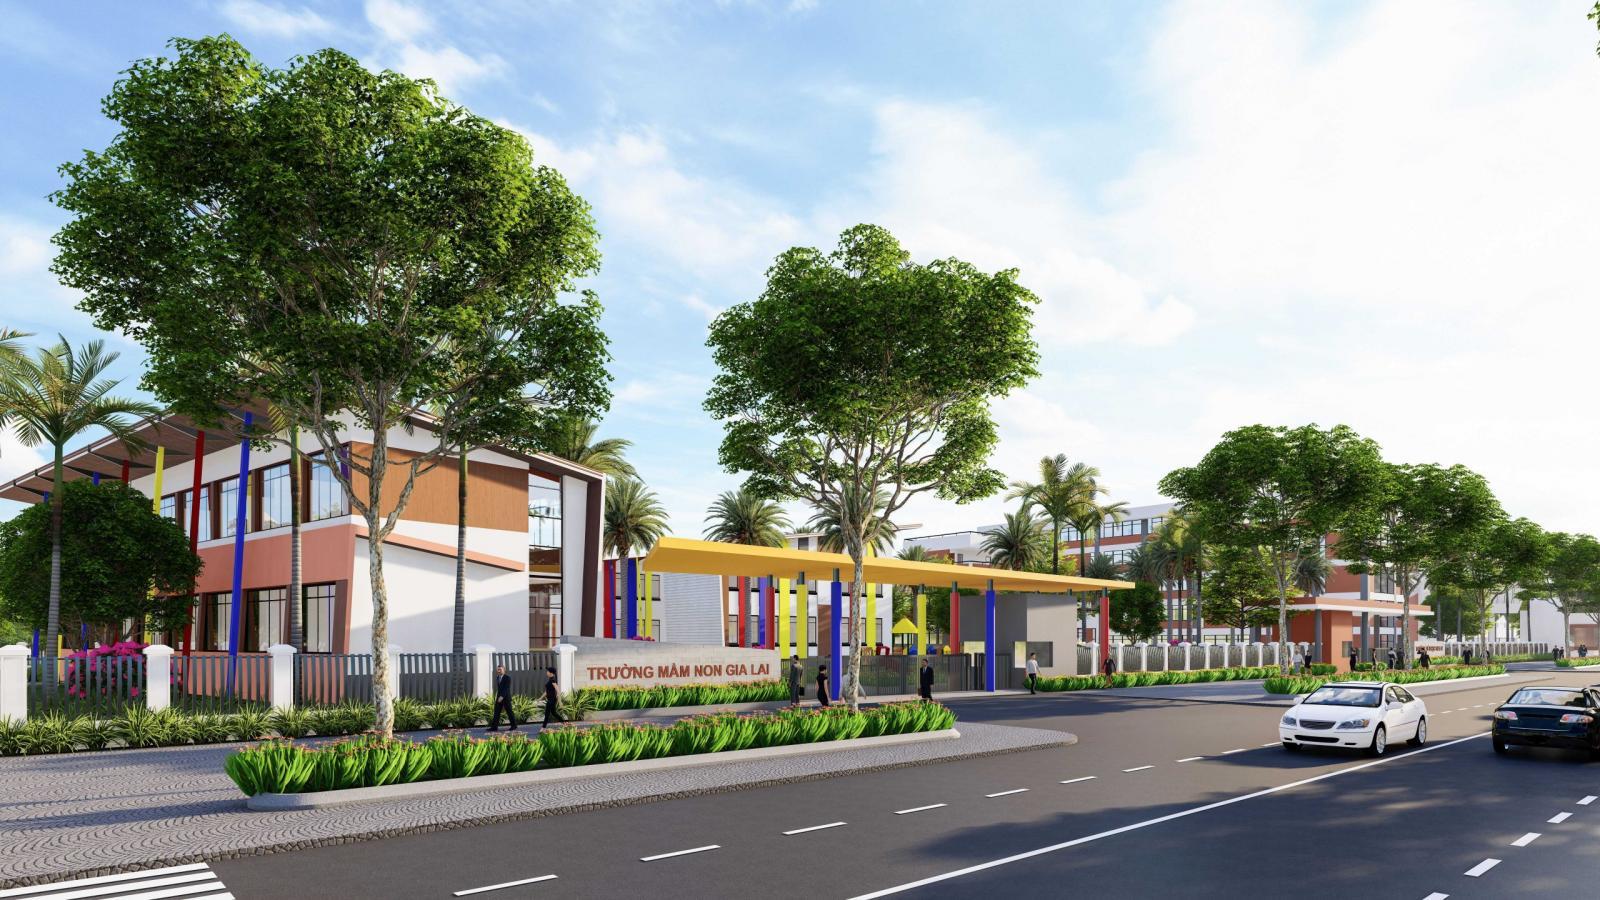 Trường mầm non tại Gia Lai New City